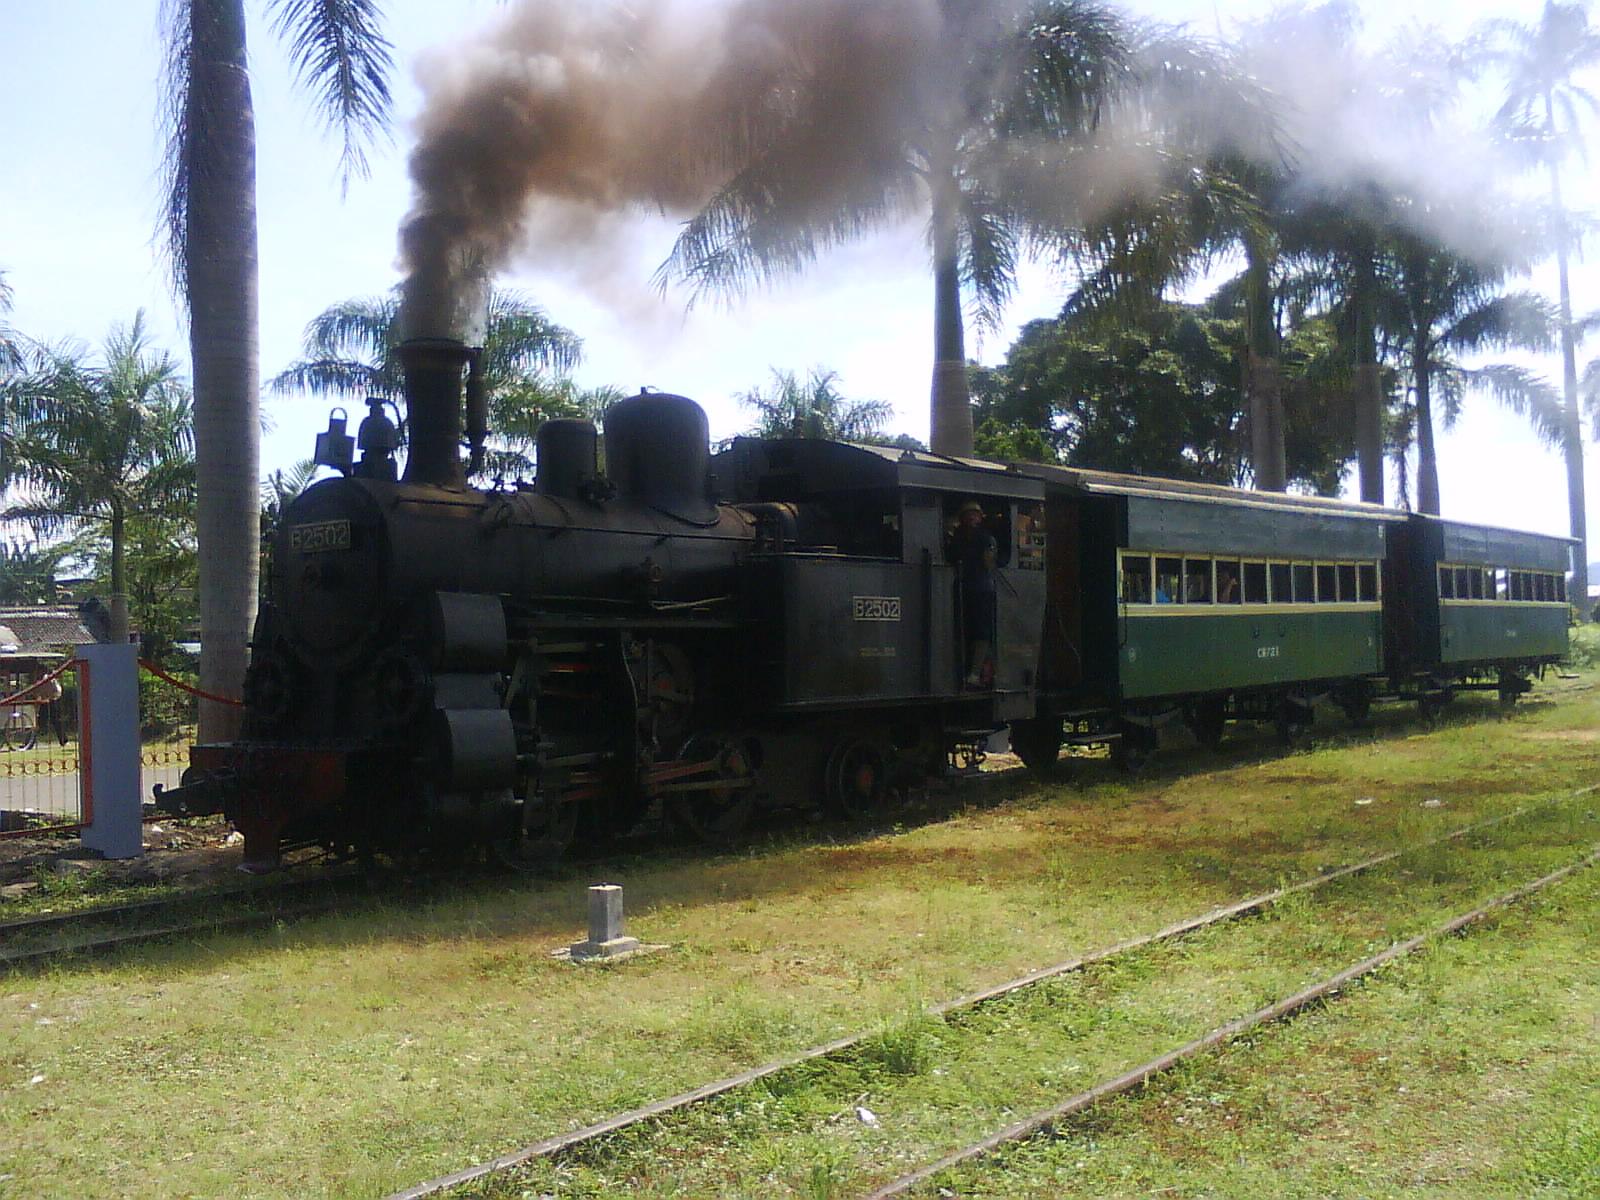 Goa Kreo Paket Wisata Kereta Uap Ambarawa